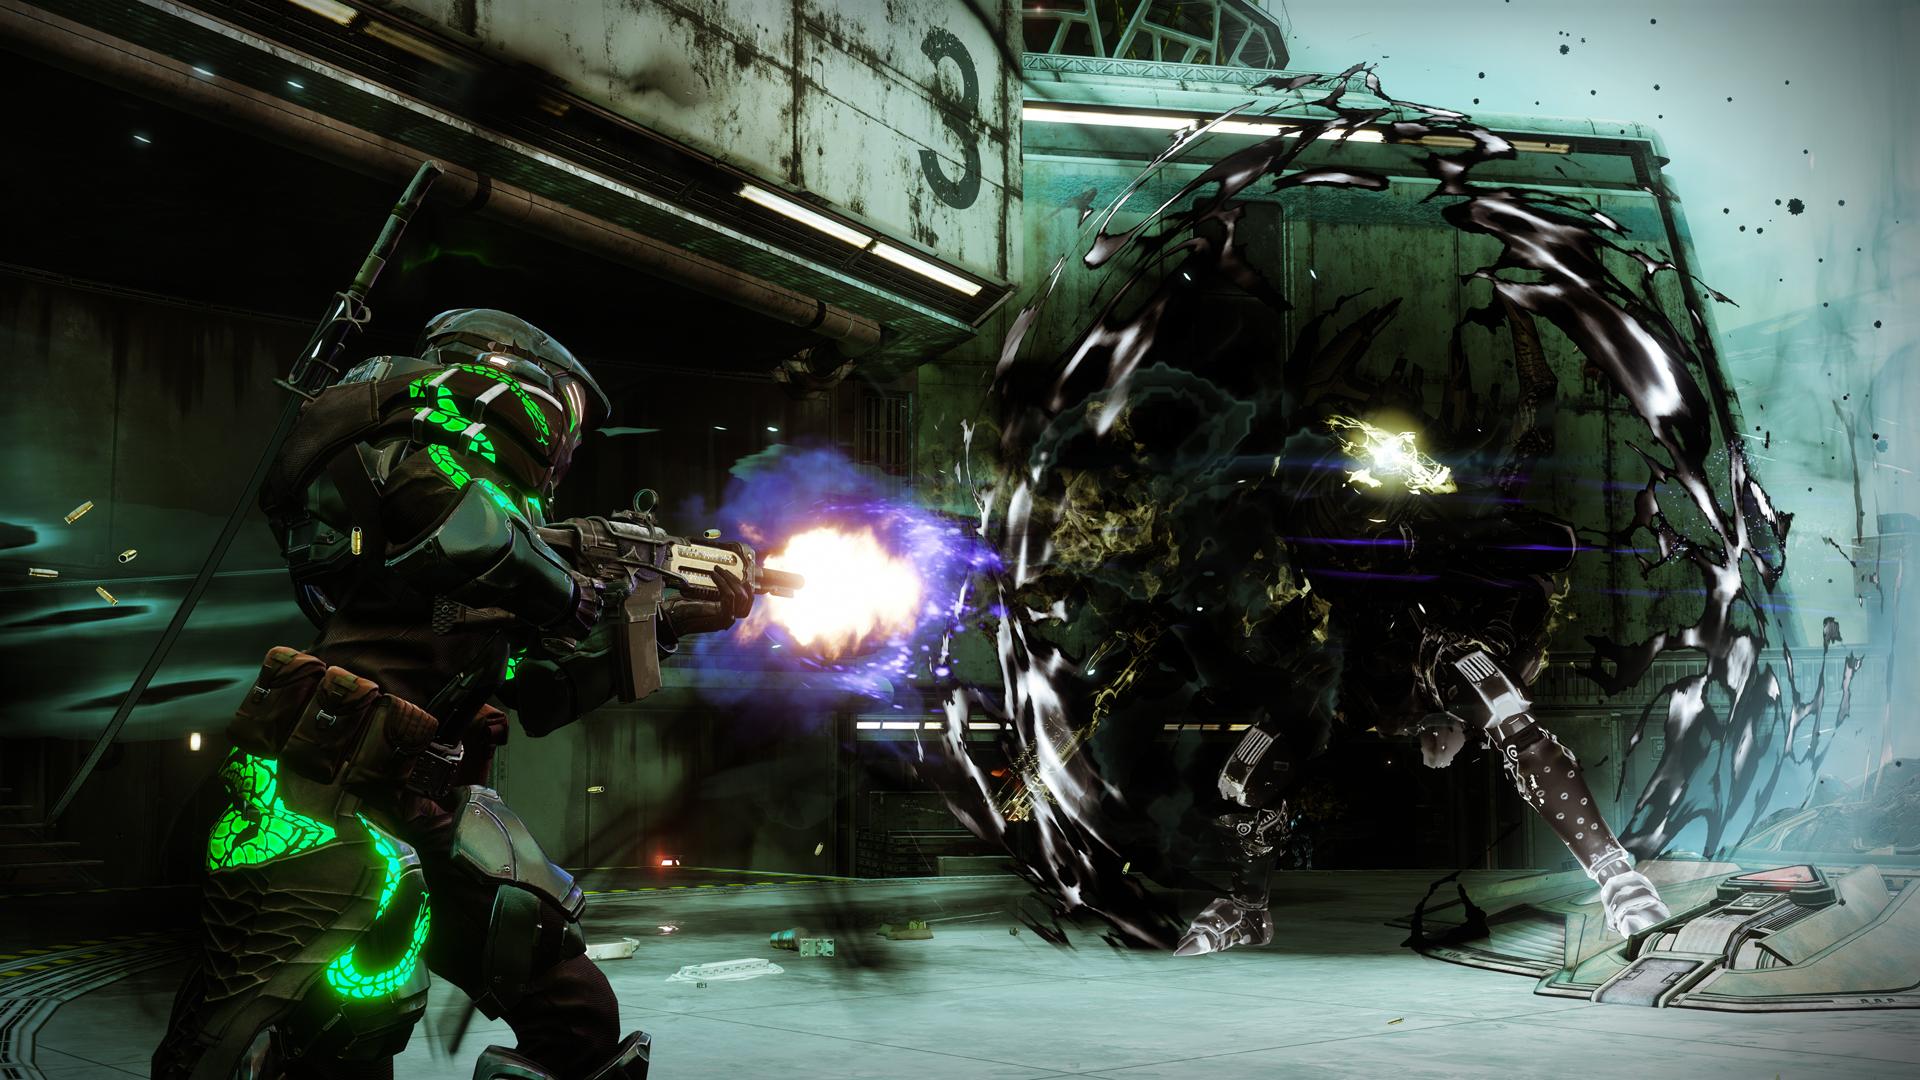 Reaper Destiny 2 Gambit Prime